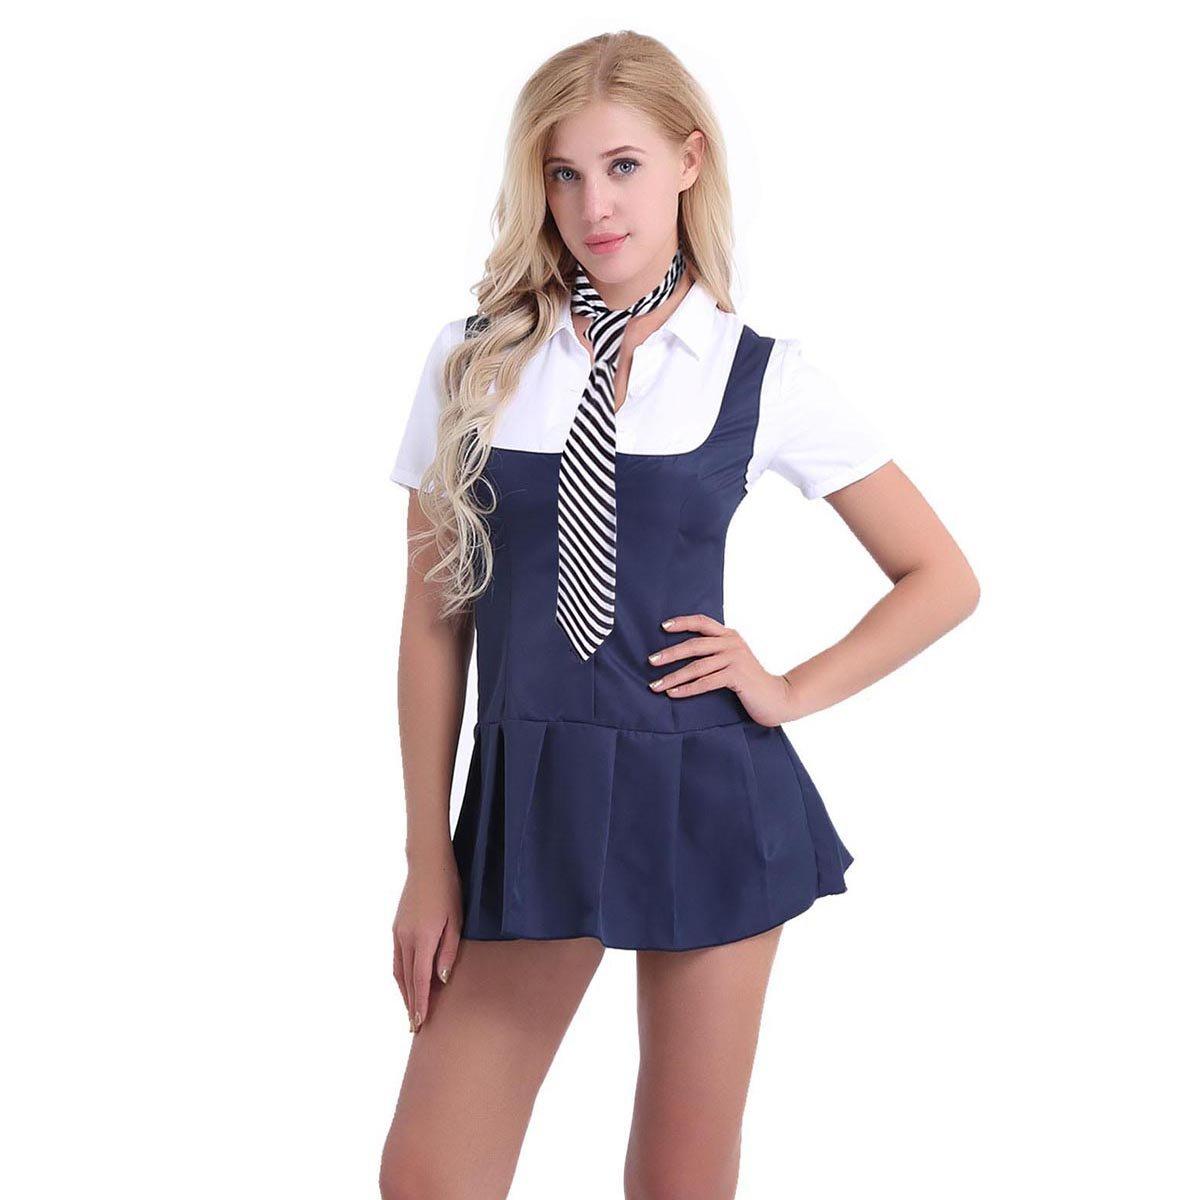 Alvivi Women's Adult Schoolgirl Role Play Cosplay Costume Fancy Dress Pleated Skirt Uniform